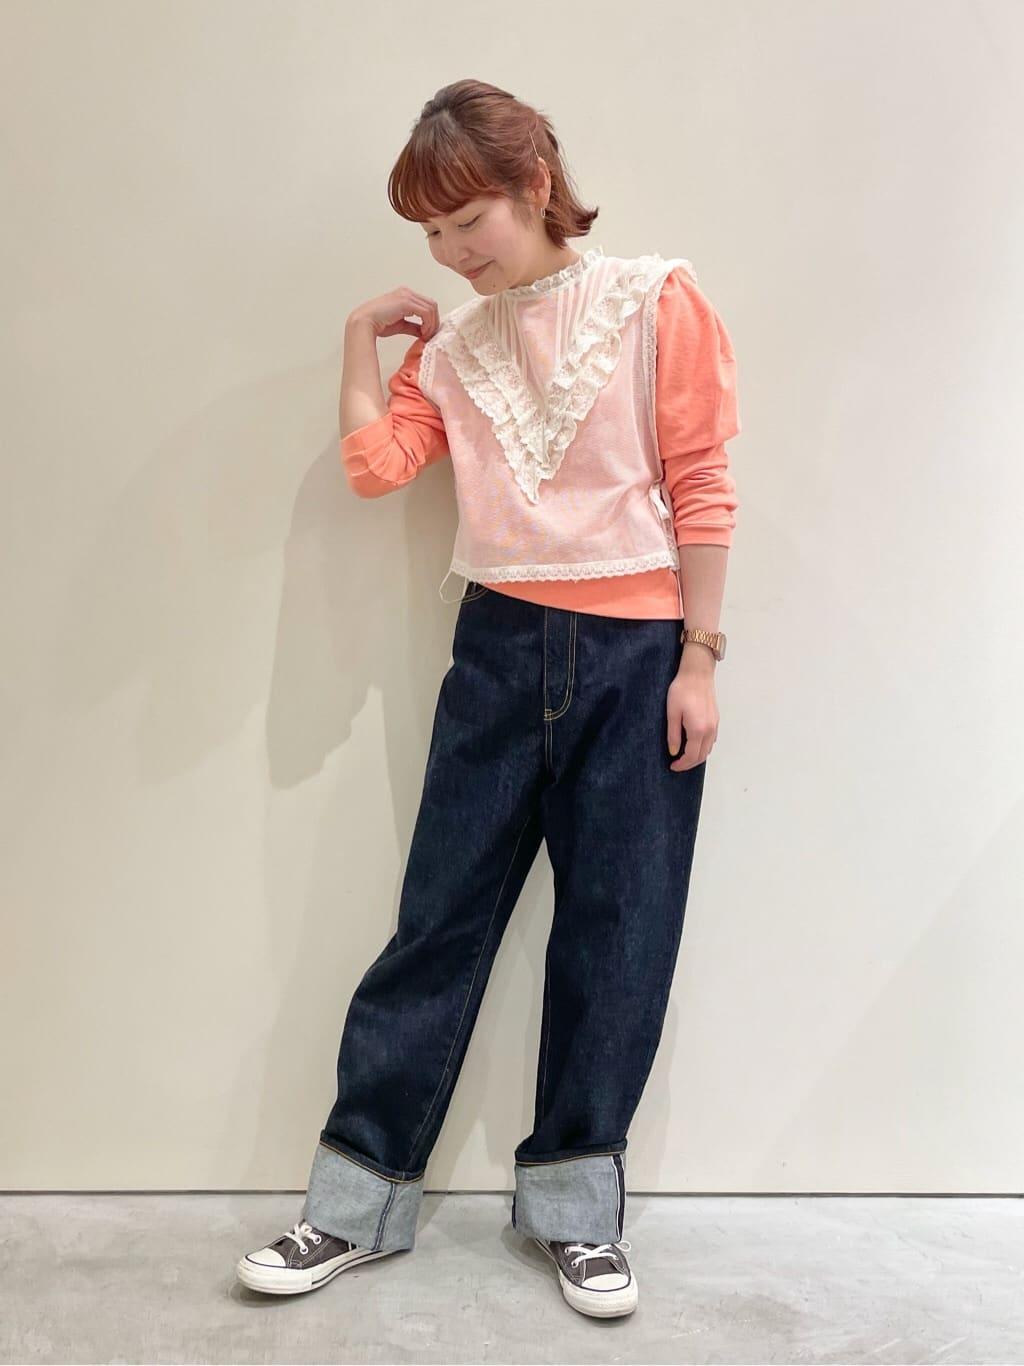 Dot and Stripes CHILD WOMAN CHILD WOMAN , PAR ICI 新宿ミロード 身長:160cm 2021.09.03